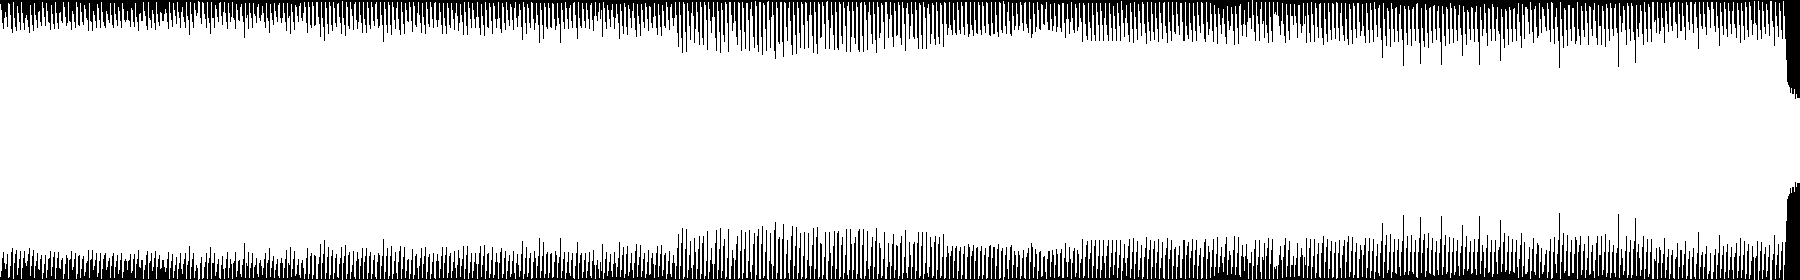 Riemann Techno Top Loops 3 audio waveform